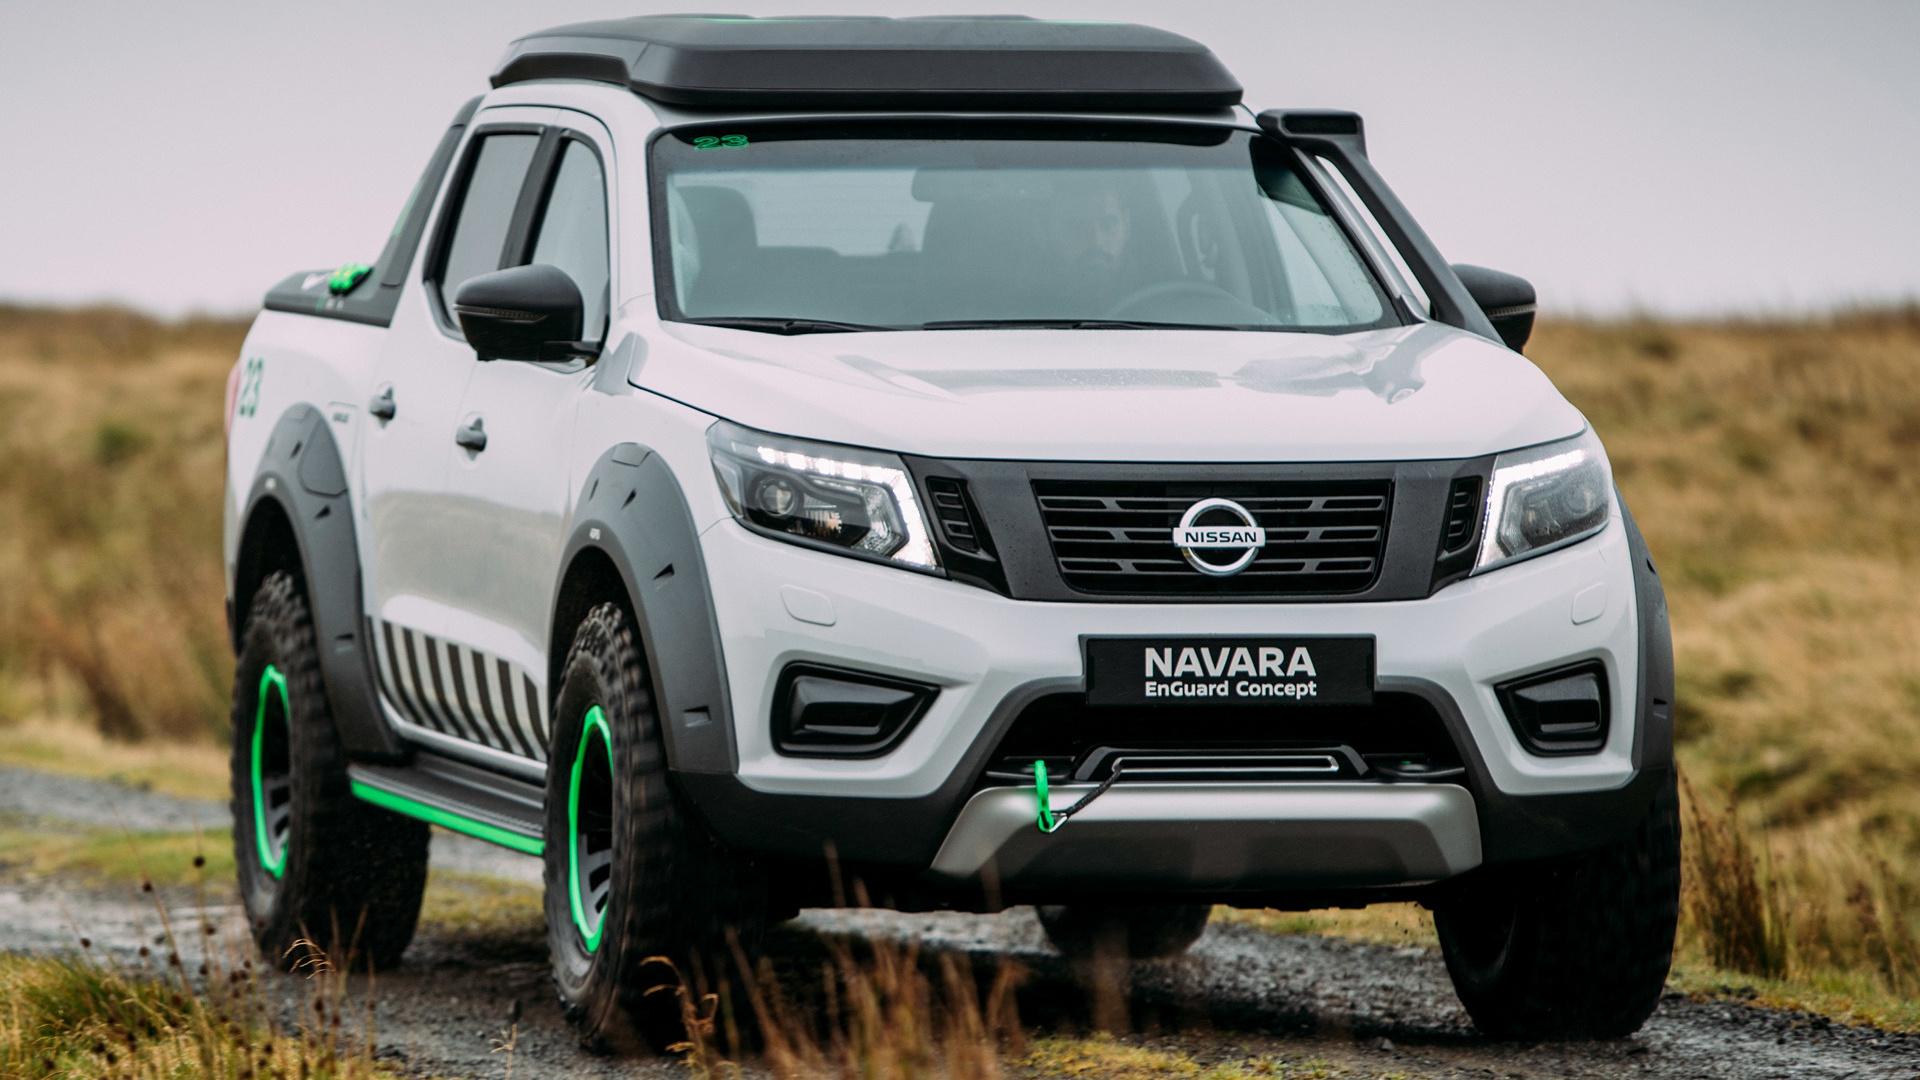 Nissan Navara EnGuard Concept (2016) Wallpapers and HD ...